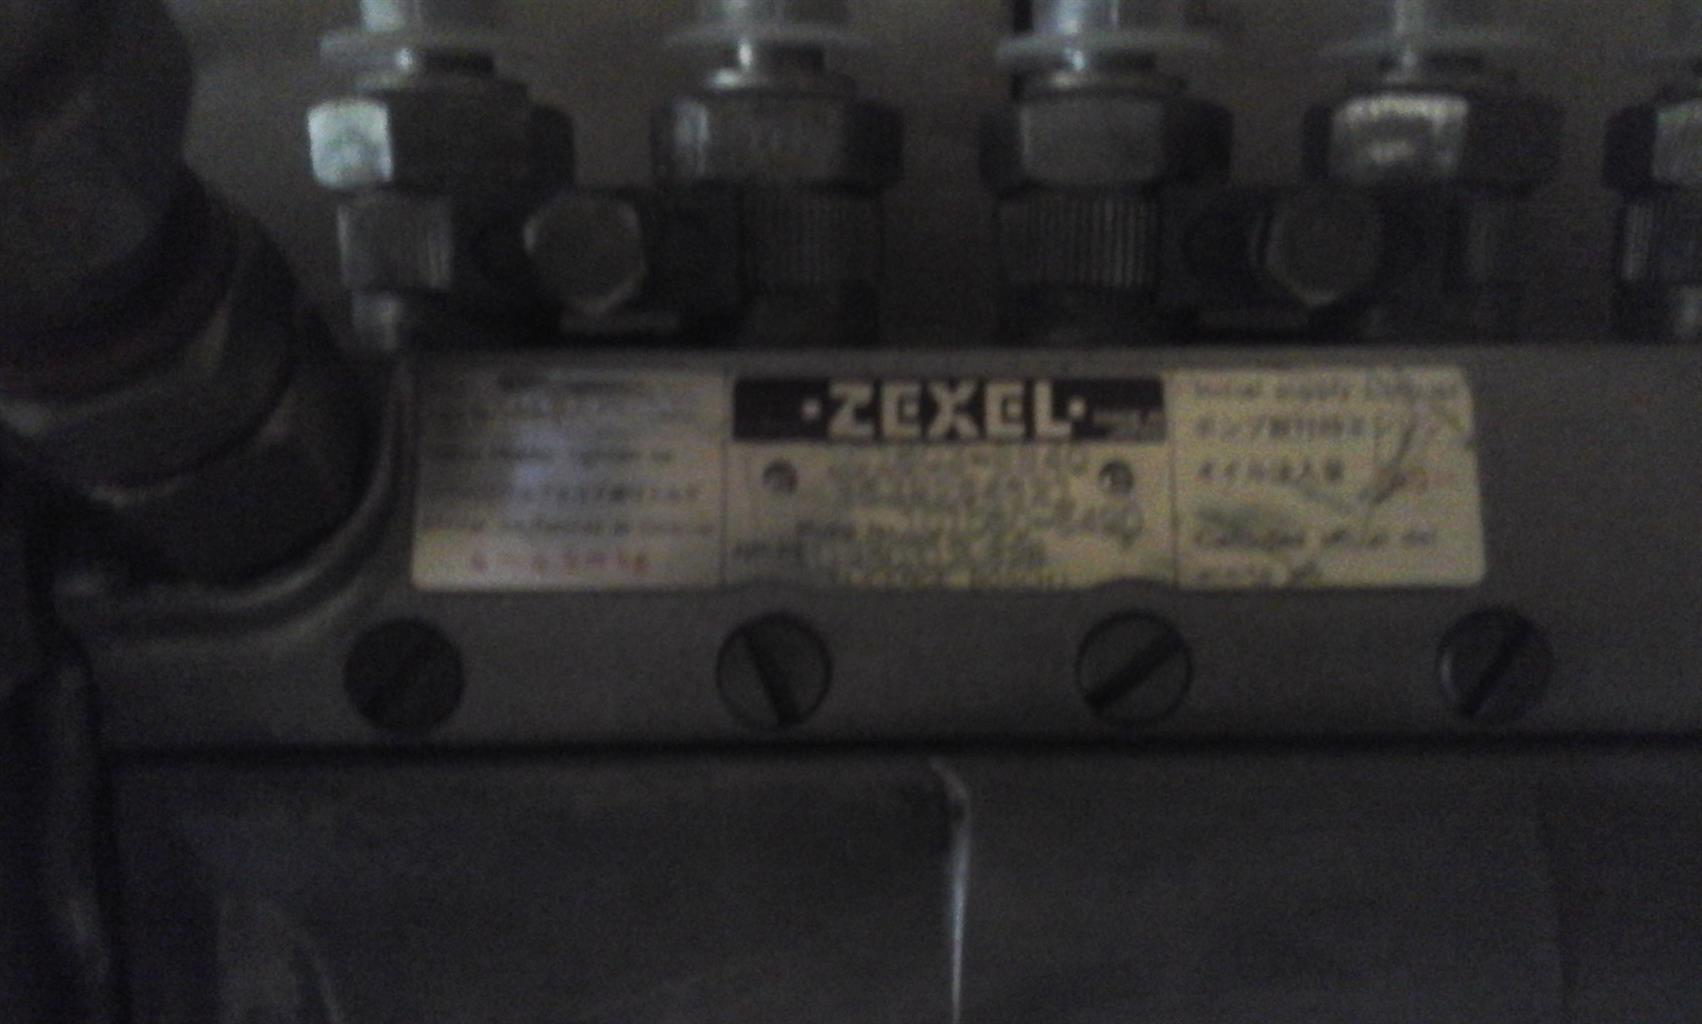 Zexcel diesel injector pump